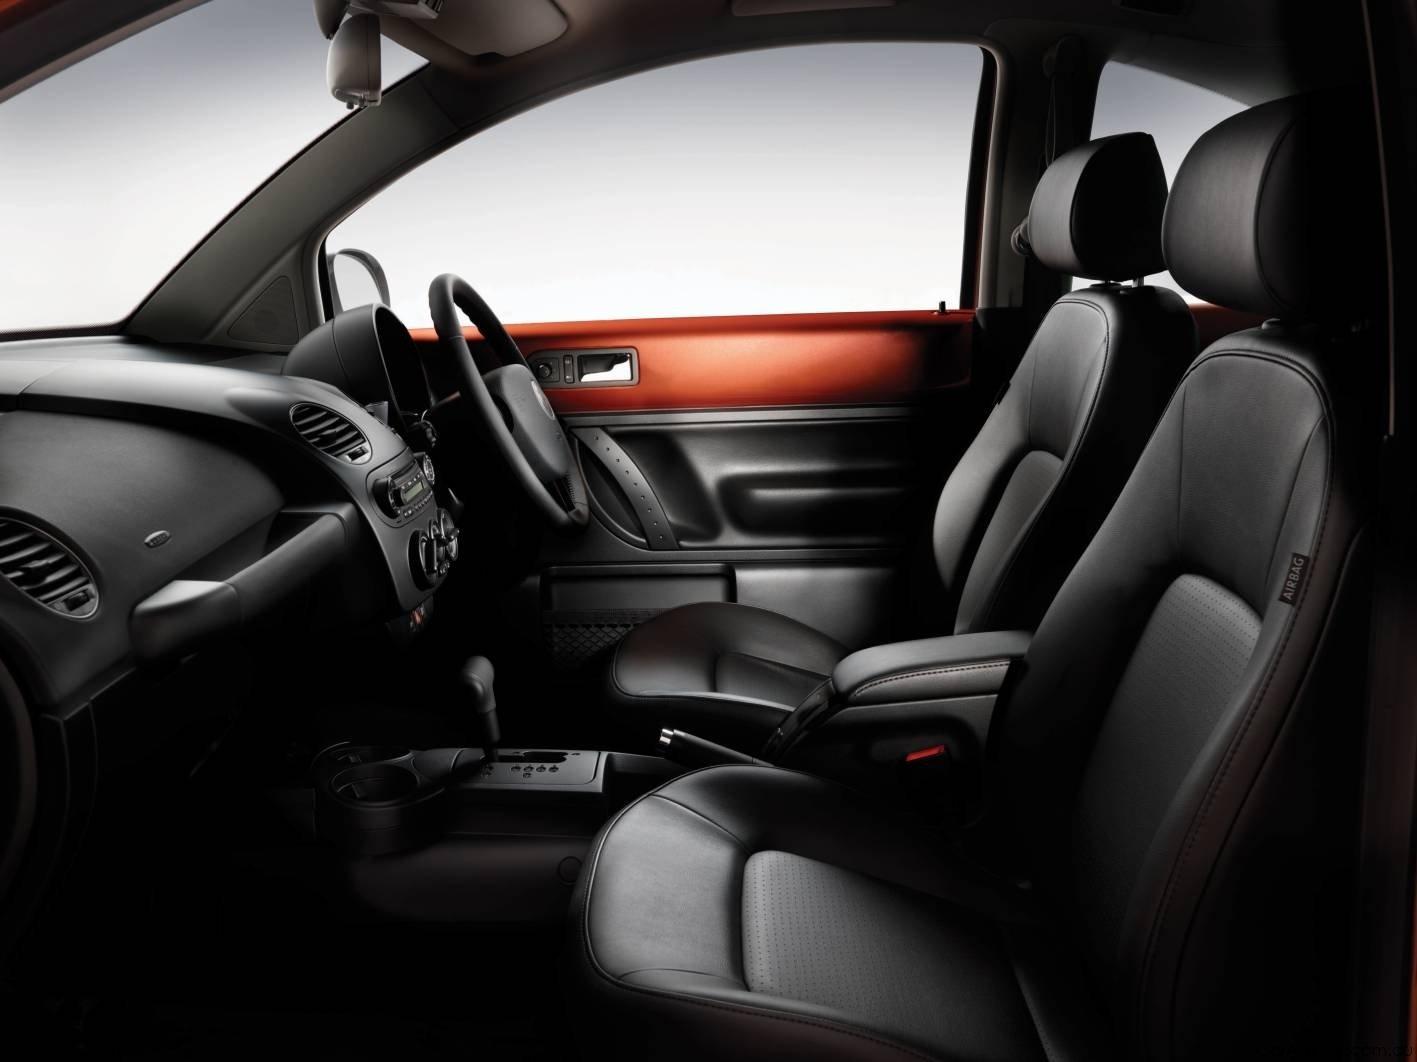 Toyota Of Orange >> Volkswagen Beetle BlackOrange Limited Edition - photos ...